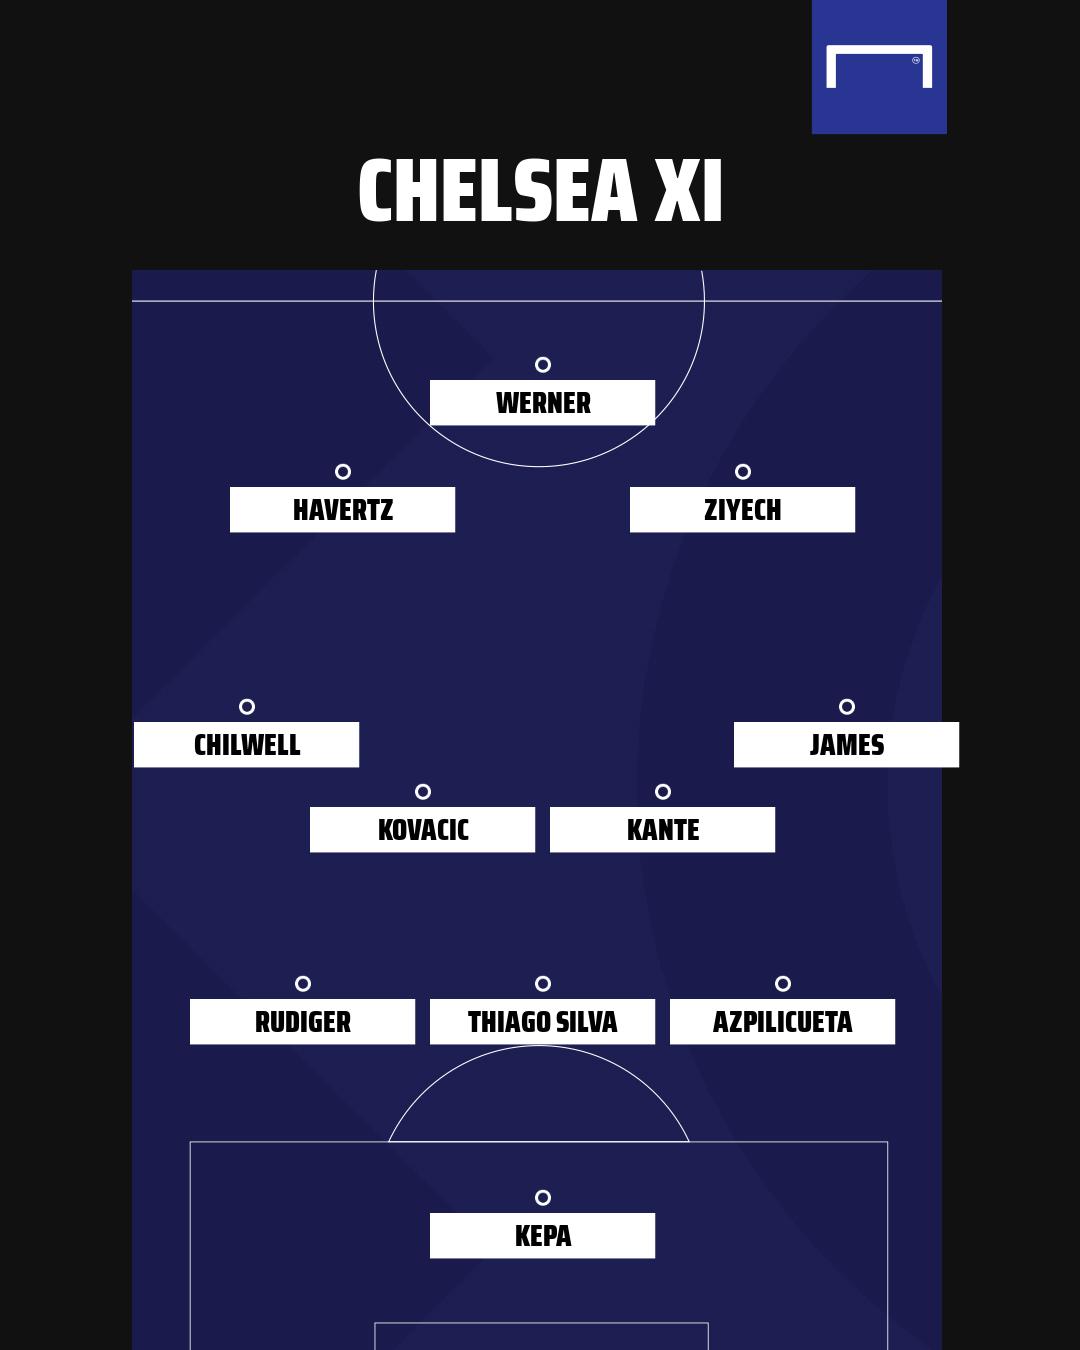 Kai Havertz thrilled to complete Chelsea move